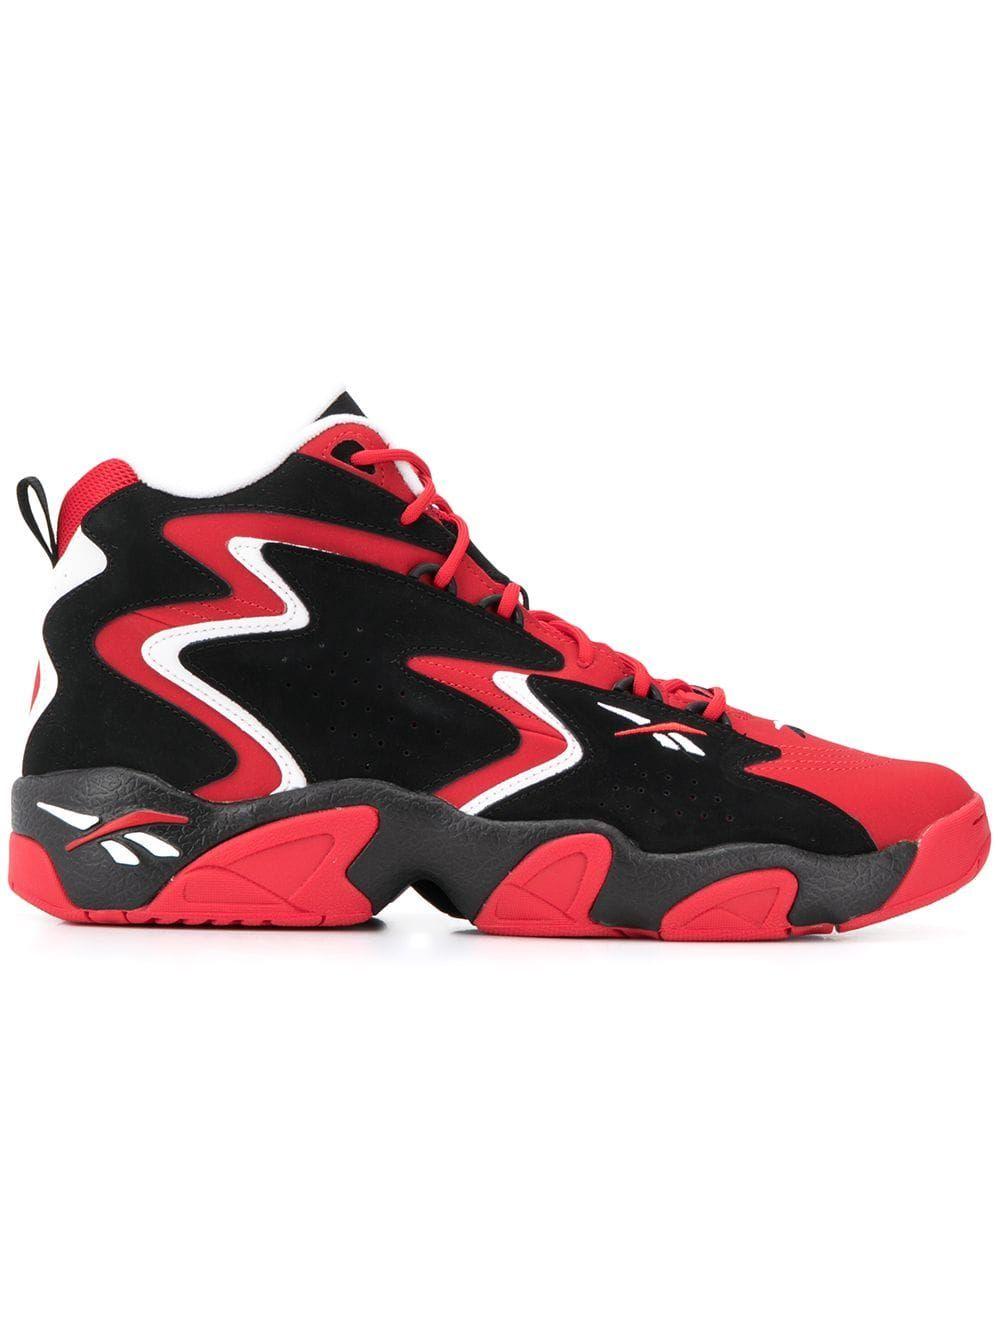 Mobius Og Sneakers In Red   Mens gym